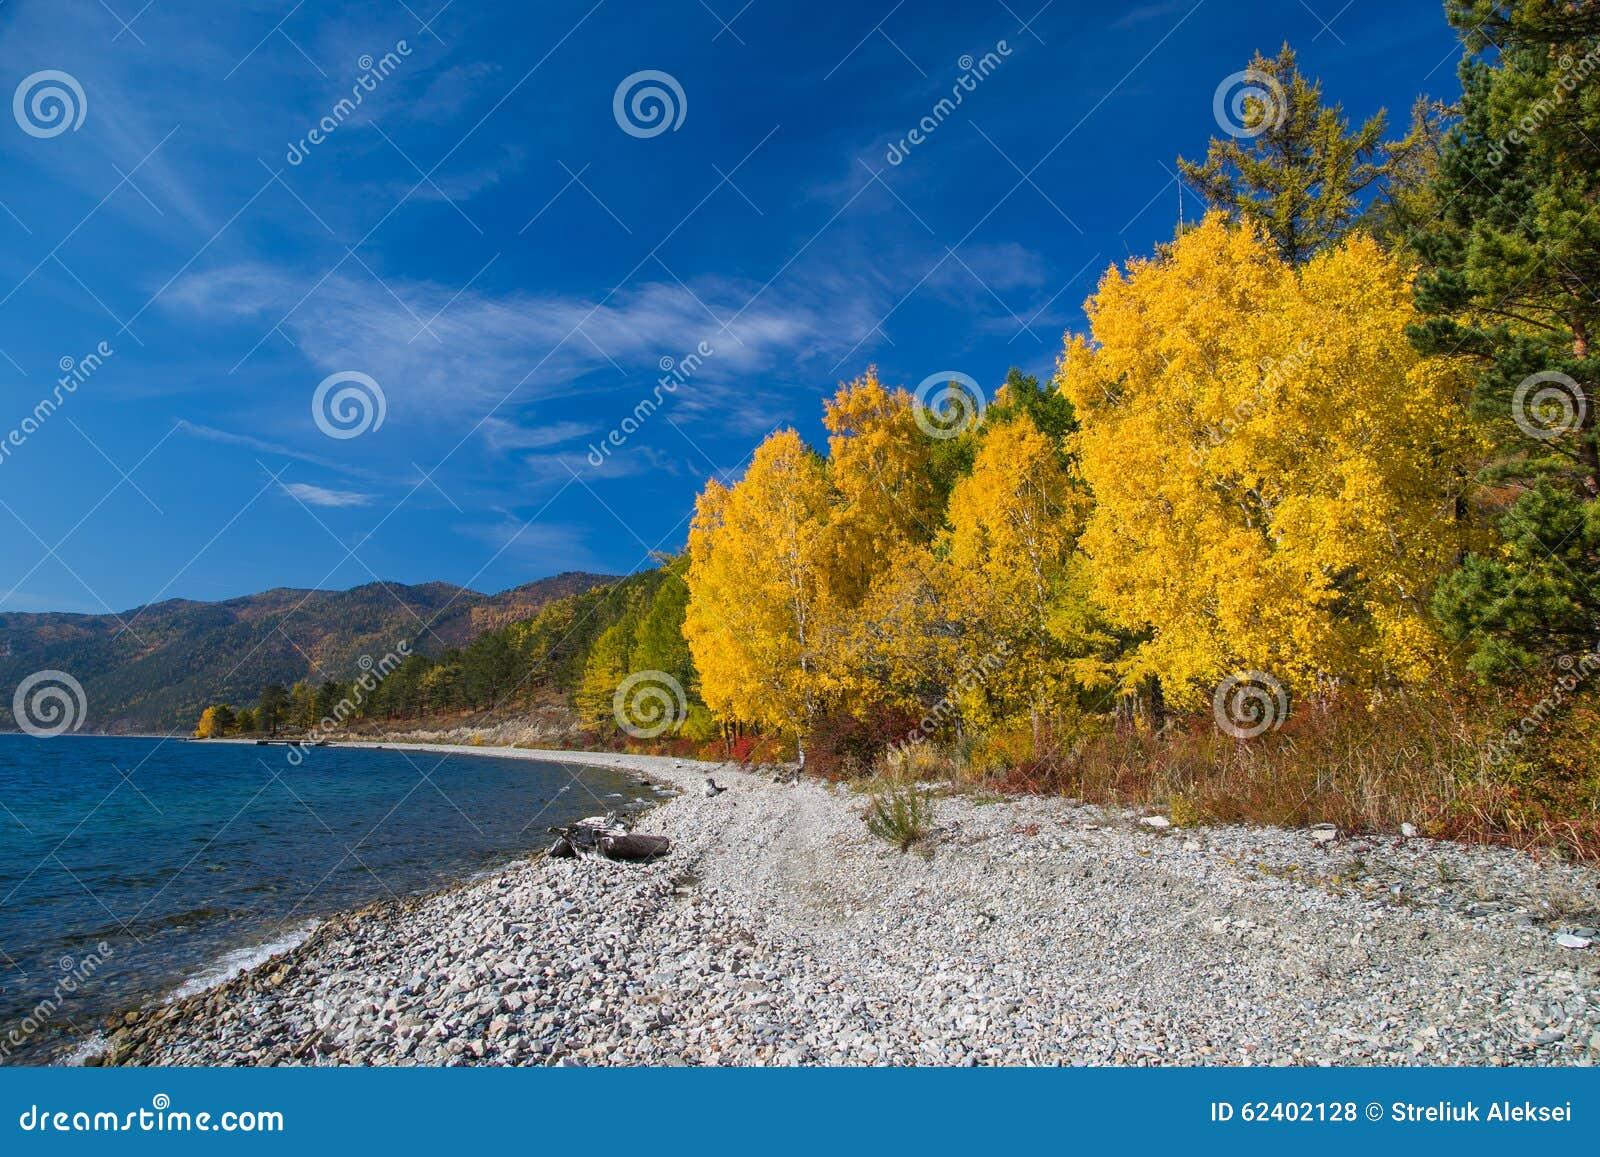 Seashore and autumn trees